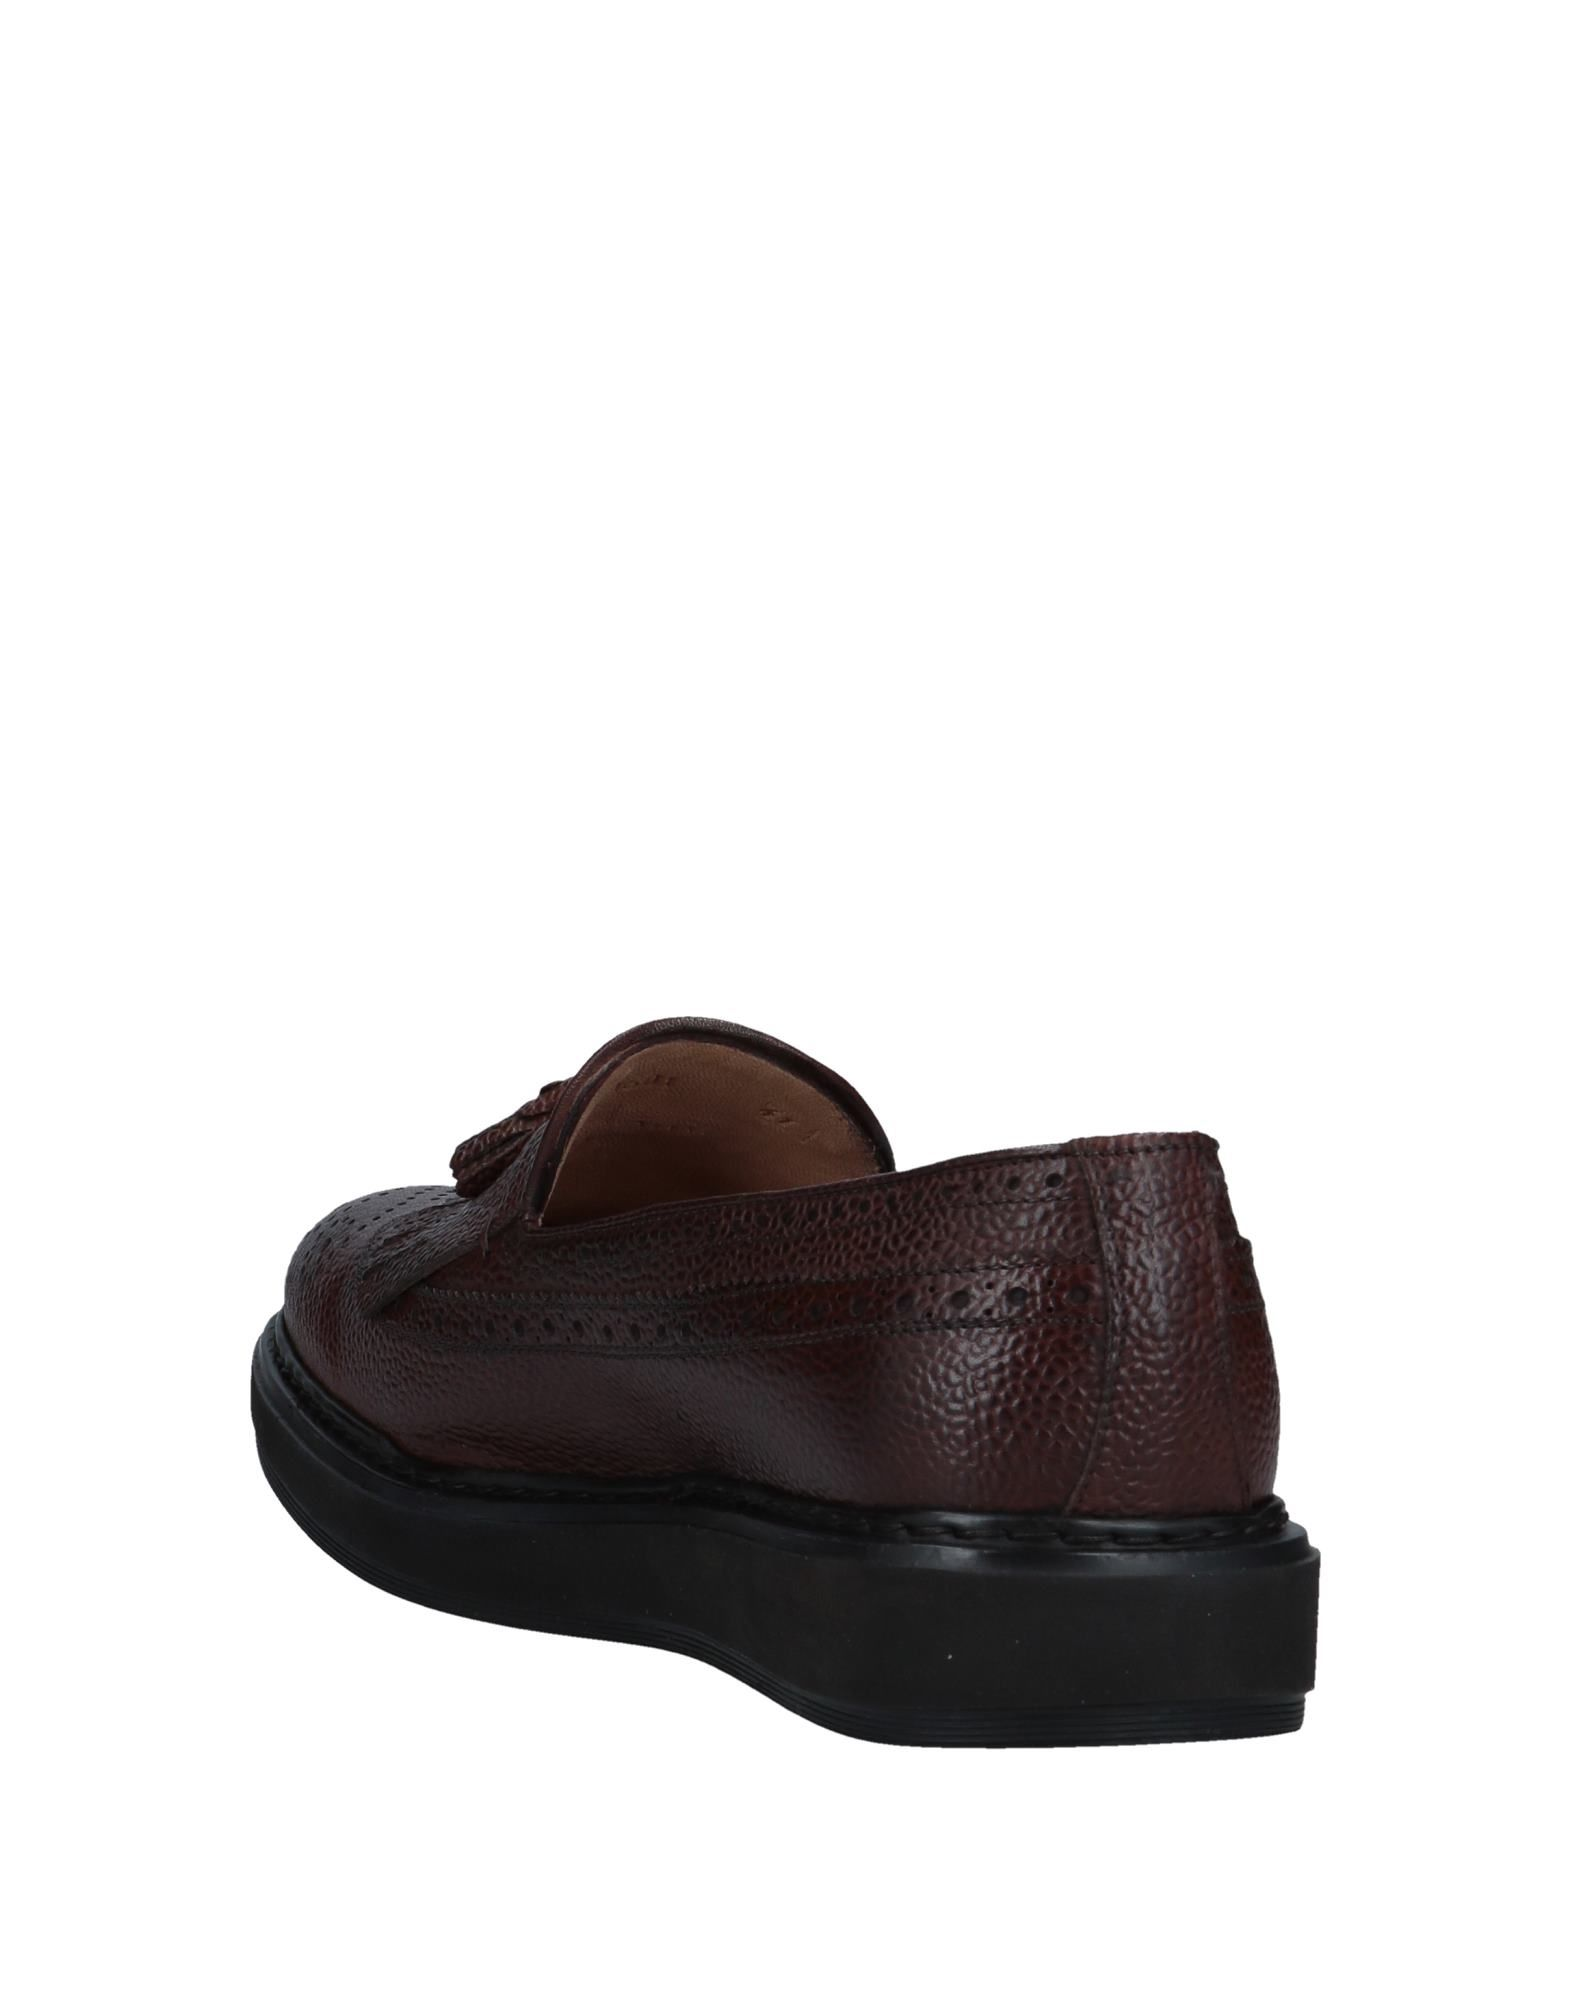 Baldinini Mokassins Herren  Schuhe 11554285TL Gute Qualität beliebte Schuhe  e1bef6